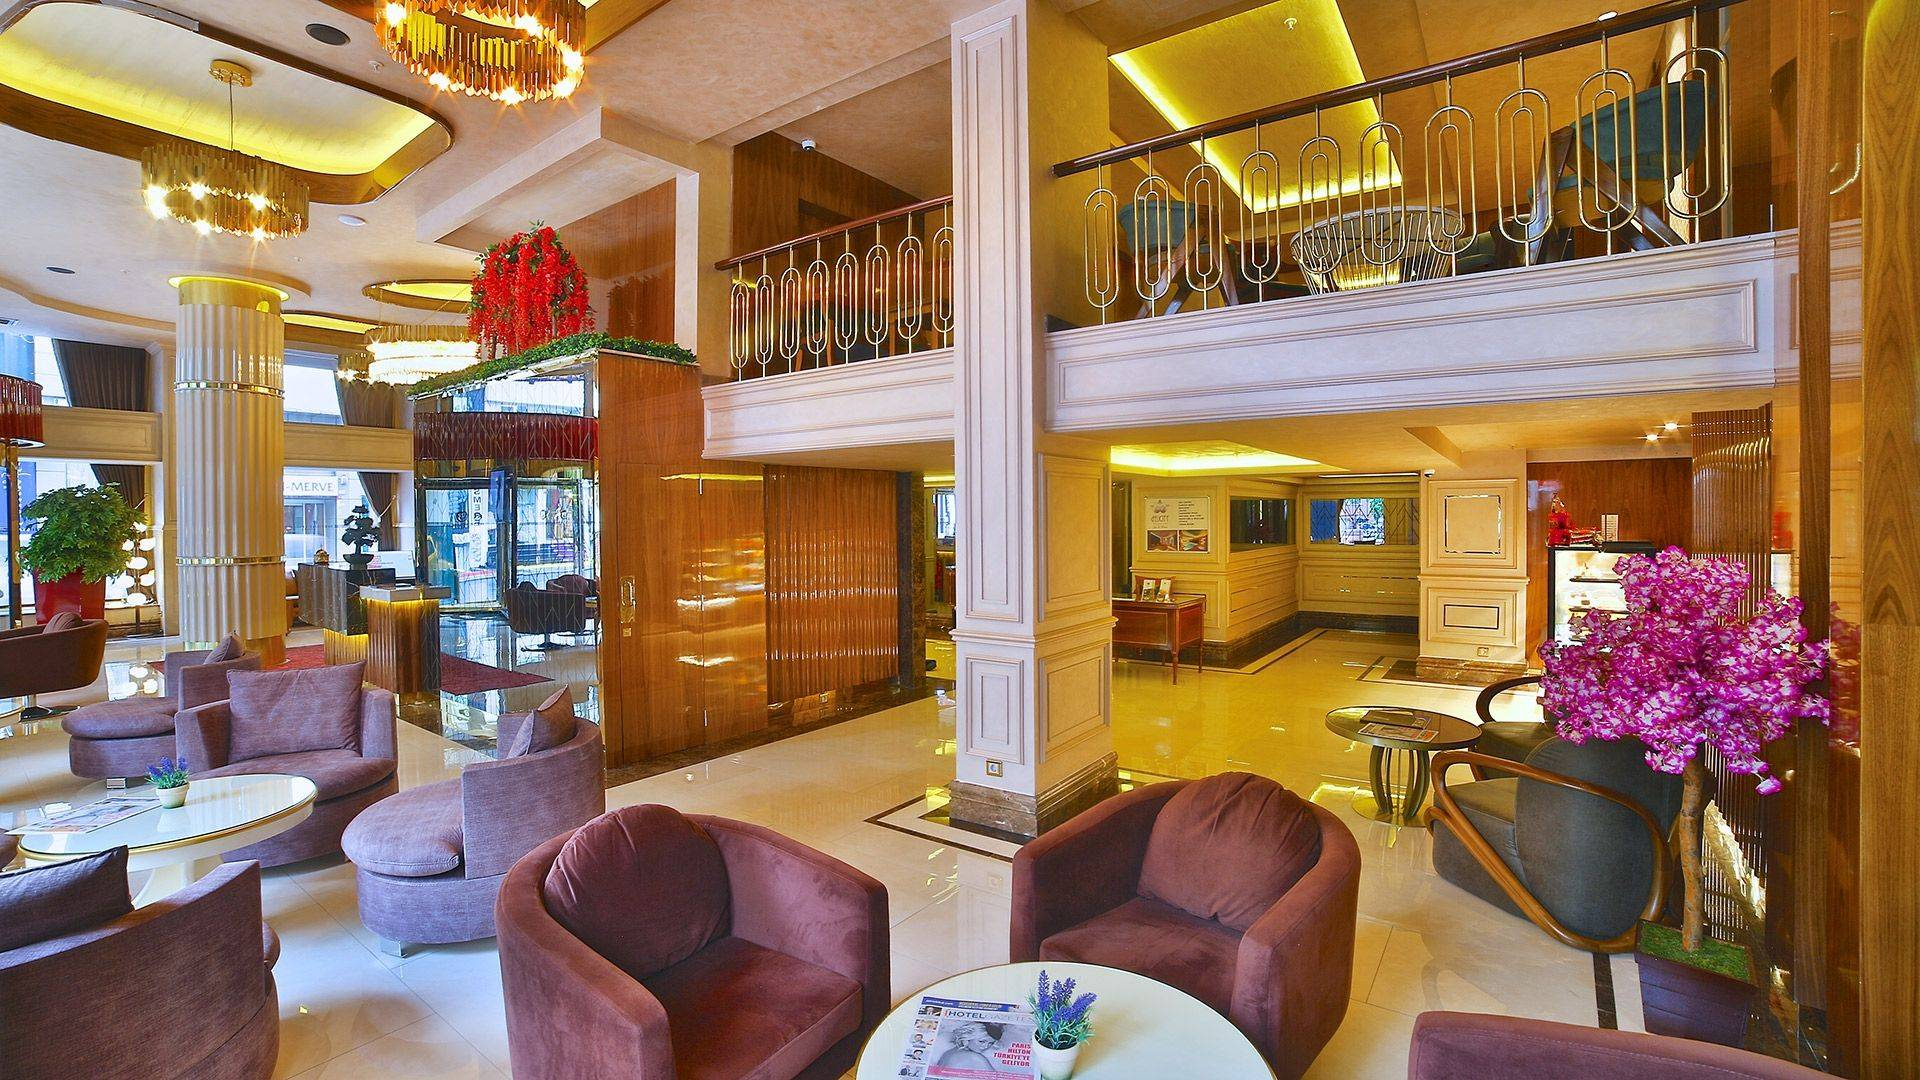 Beethoven Premium Otel, İstanbul, Laleli, 29663